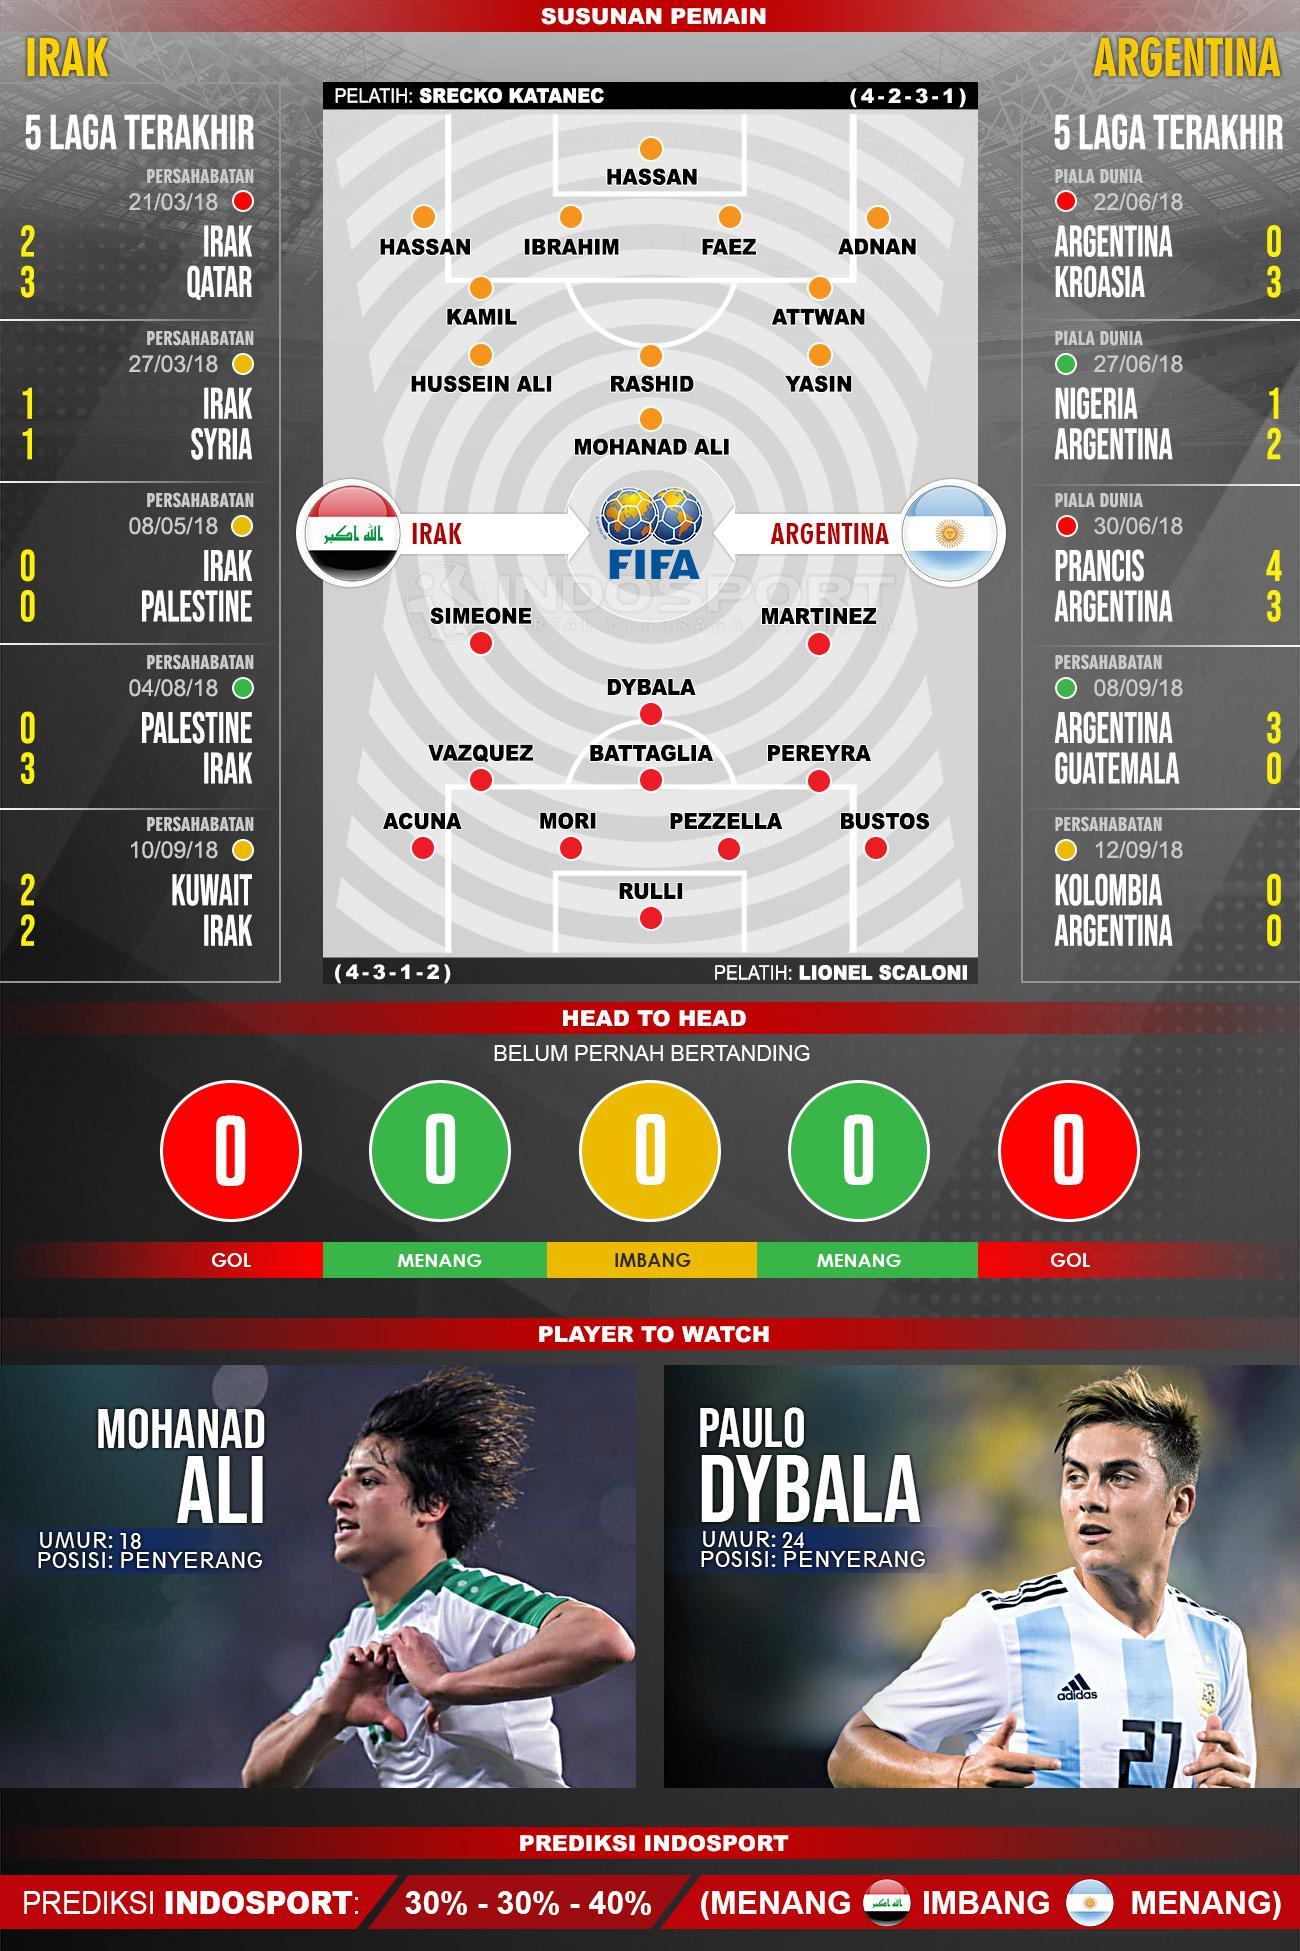 Irak vs Argentina (Susunan Pemain - Lima Laga Terakhir - Player to Watch - Prediksi Indosport). Copyright: Indosport.com